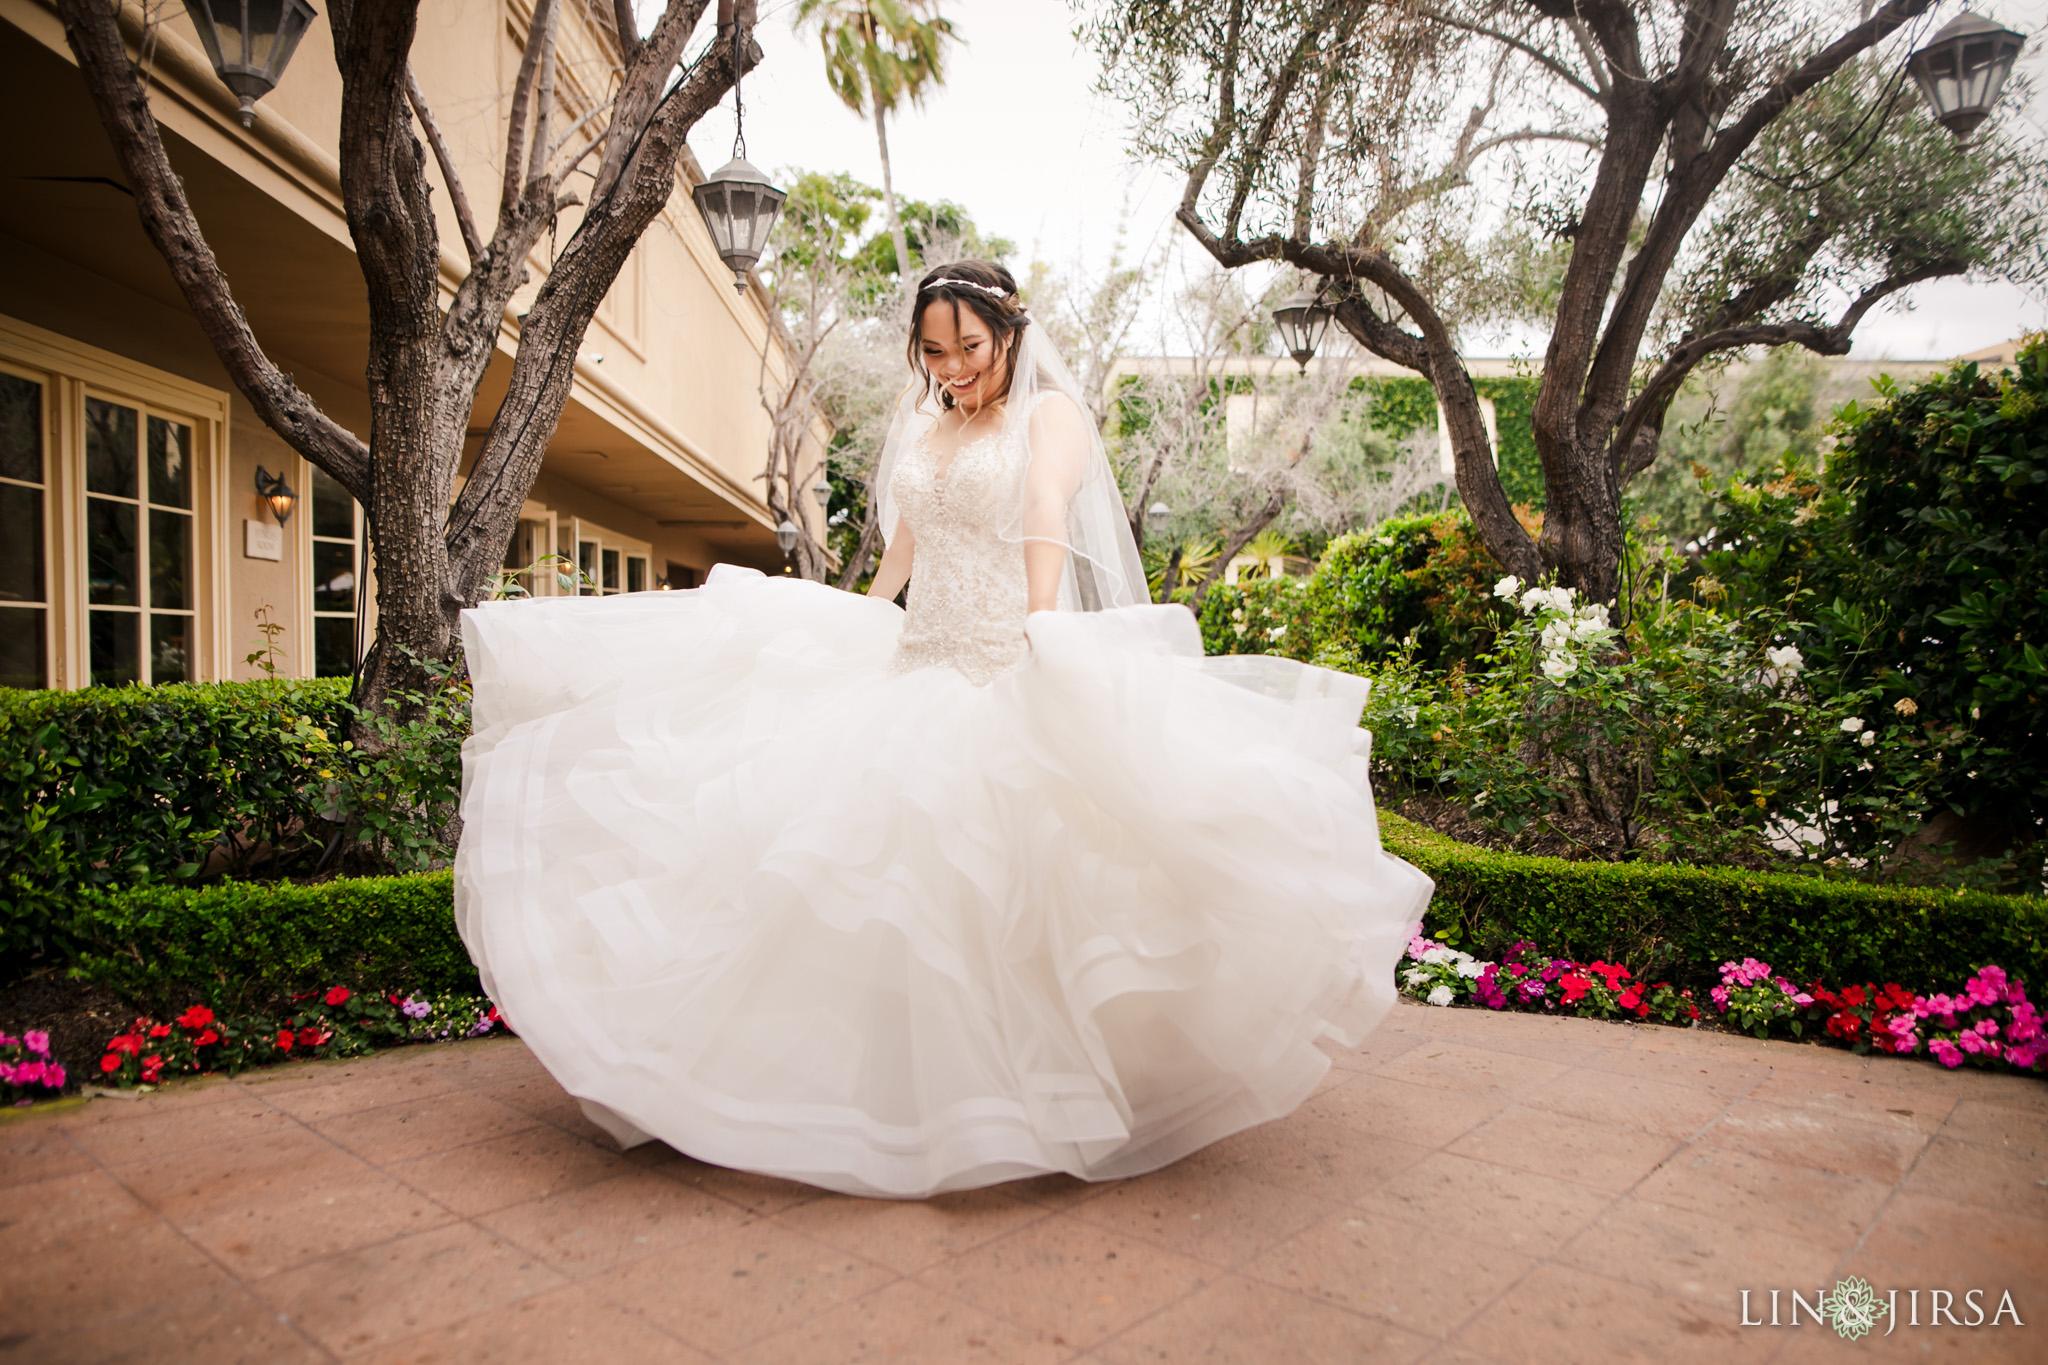 07 surf and sand resort laguna beach bride wedding photography